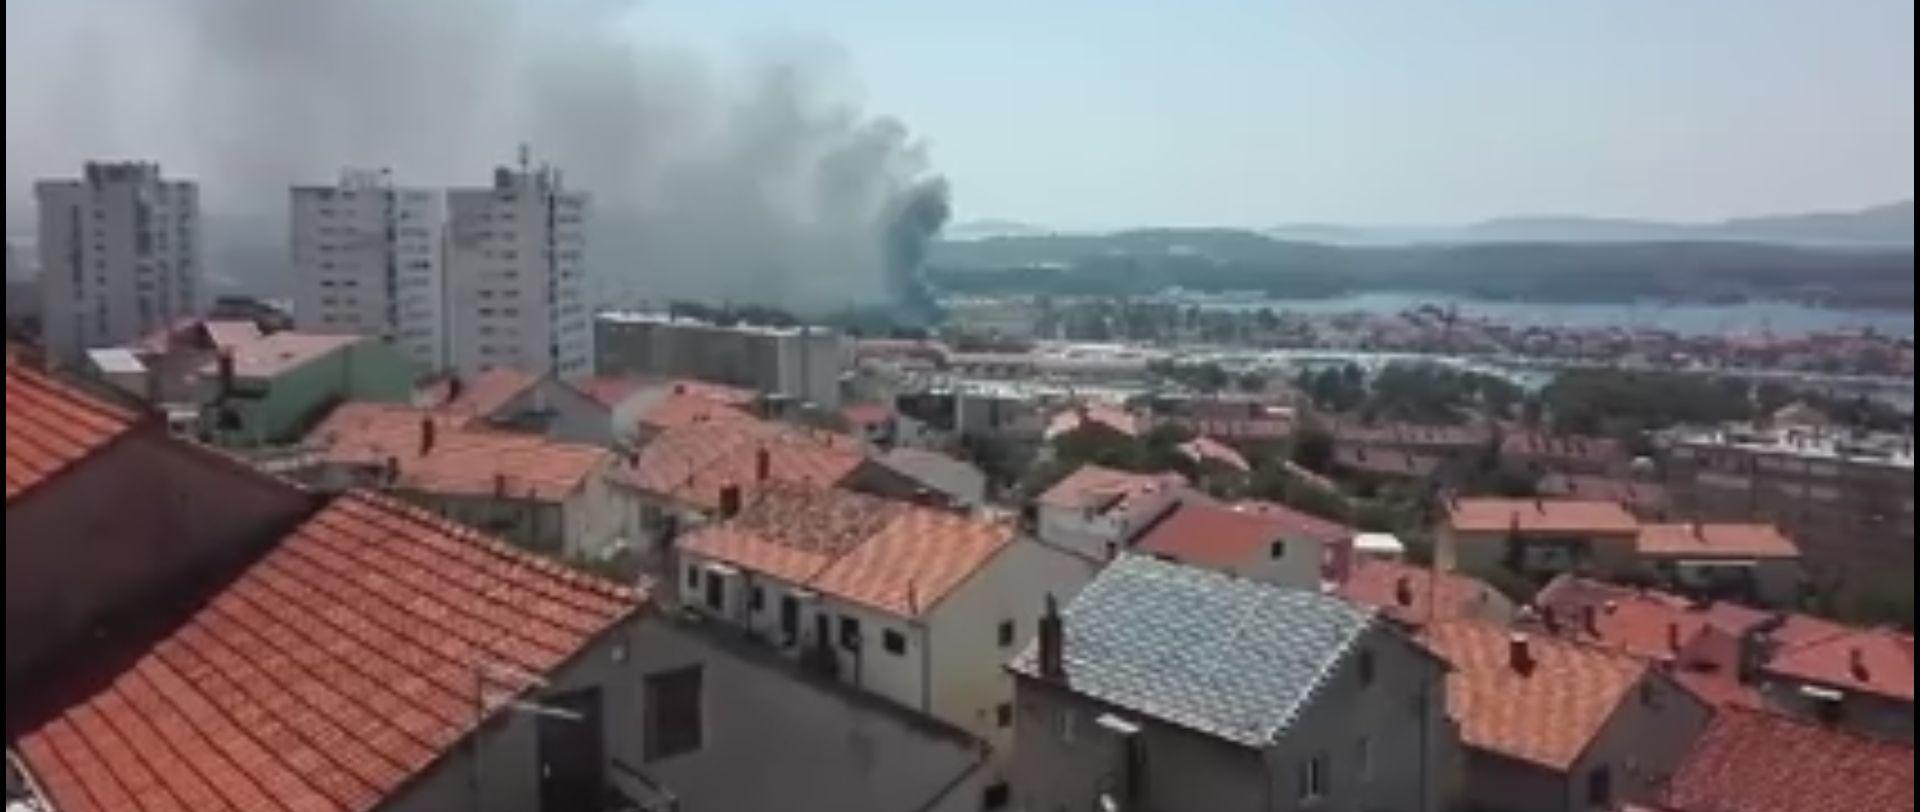 VIDEO: ŠIBENIK Buknuo požar u skladištu NCP-a, dim prekrio grad